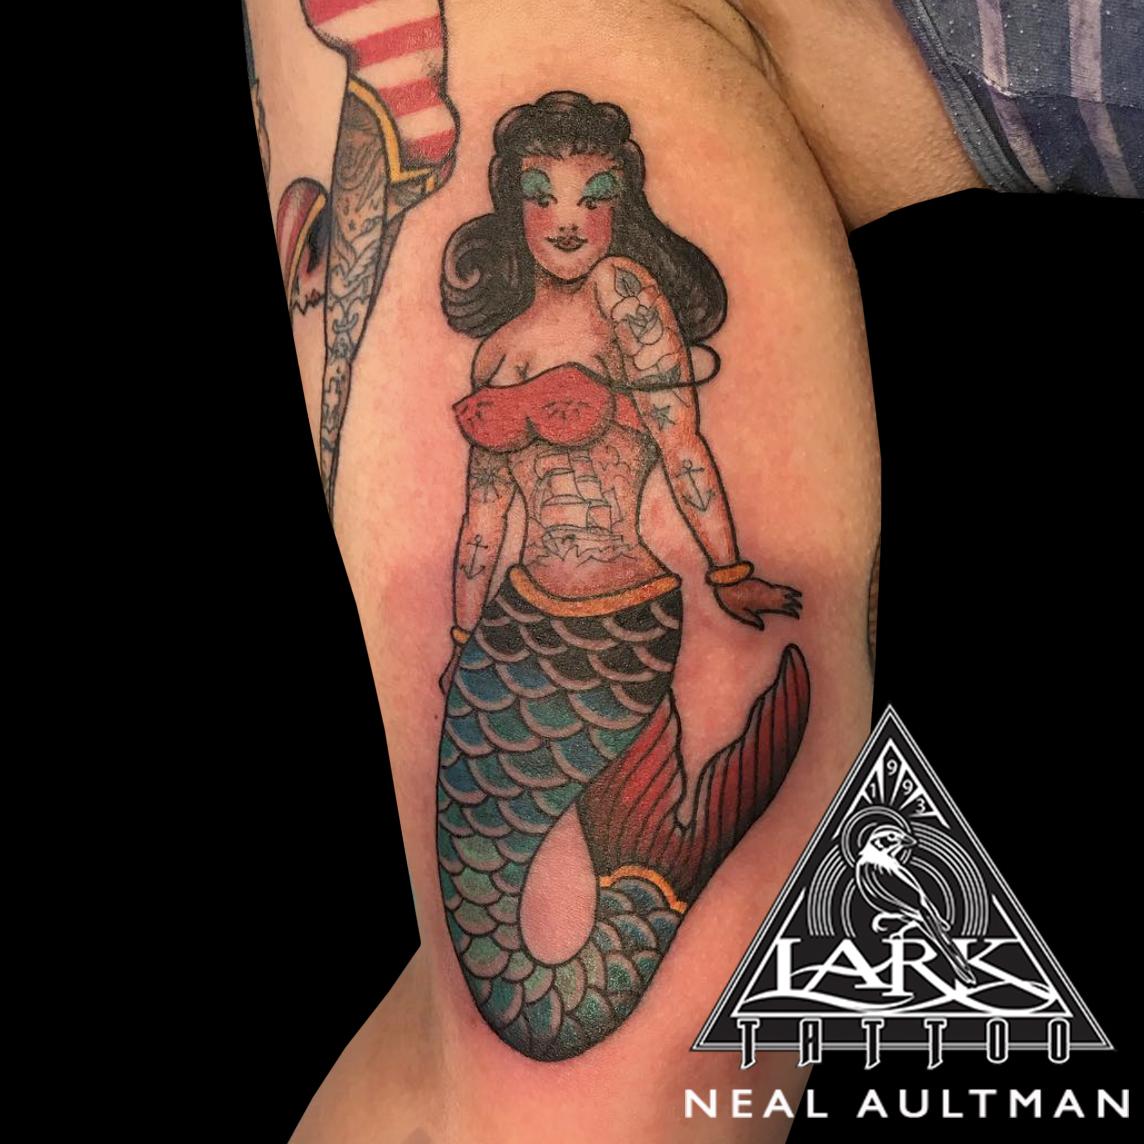 #traditional #traditionaltattoo #colortattoo #mermaid #mermaidtattoo #traditionalmermaid #traditionalmermaidtattoo #armtattoo #biceptattoo #tattoo #tattoos #tat #tats #tatts #tatted #tattedup #tattoist #tattooed #inked #inkedup #ink #tattoooftheday #amazingink #bodyart #tattooig #tattoosofinstagram #instatats #larktattoo #larktattoos #larktattoowestbury #westbury #longisland #NY #NewYork #usa #art #neal #aultman #nealaultman